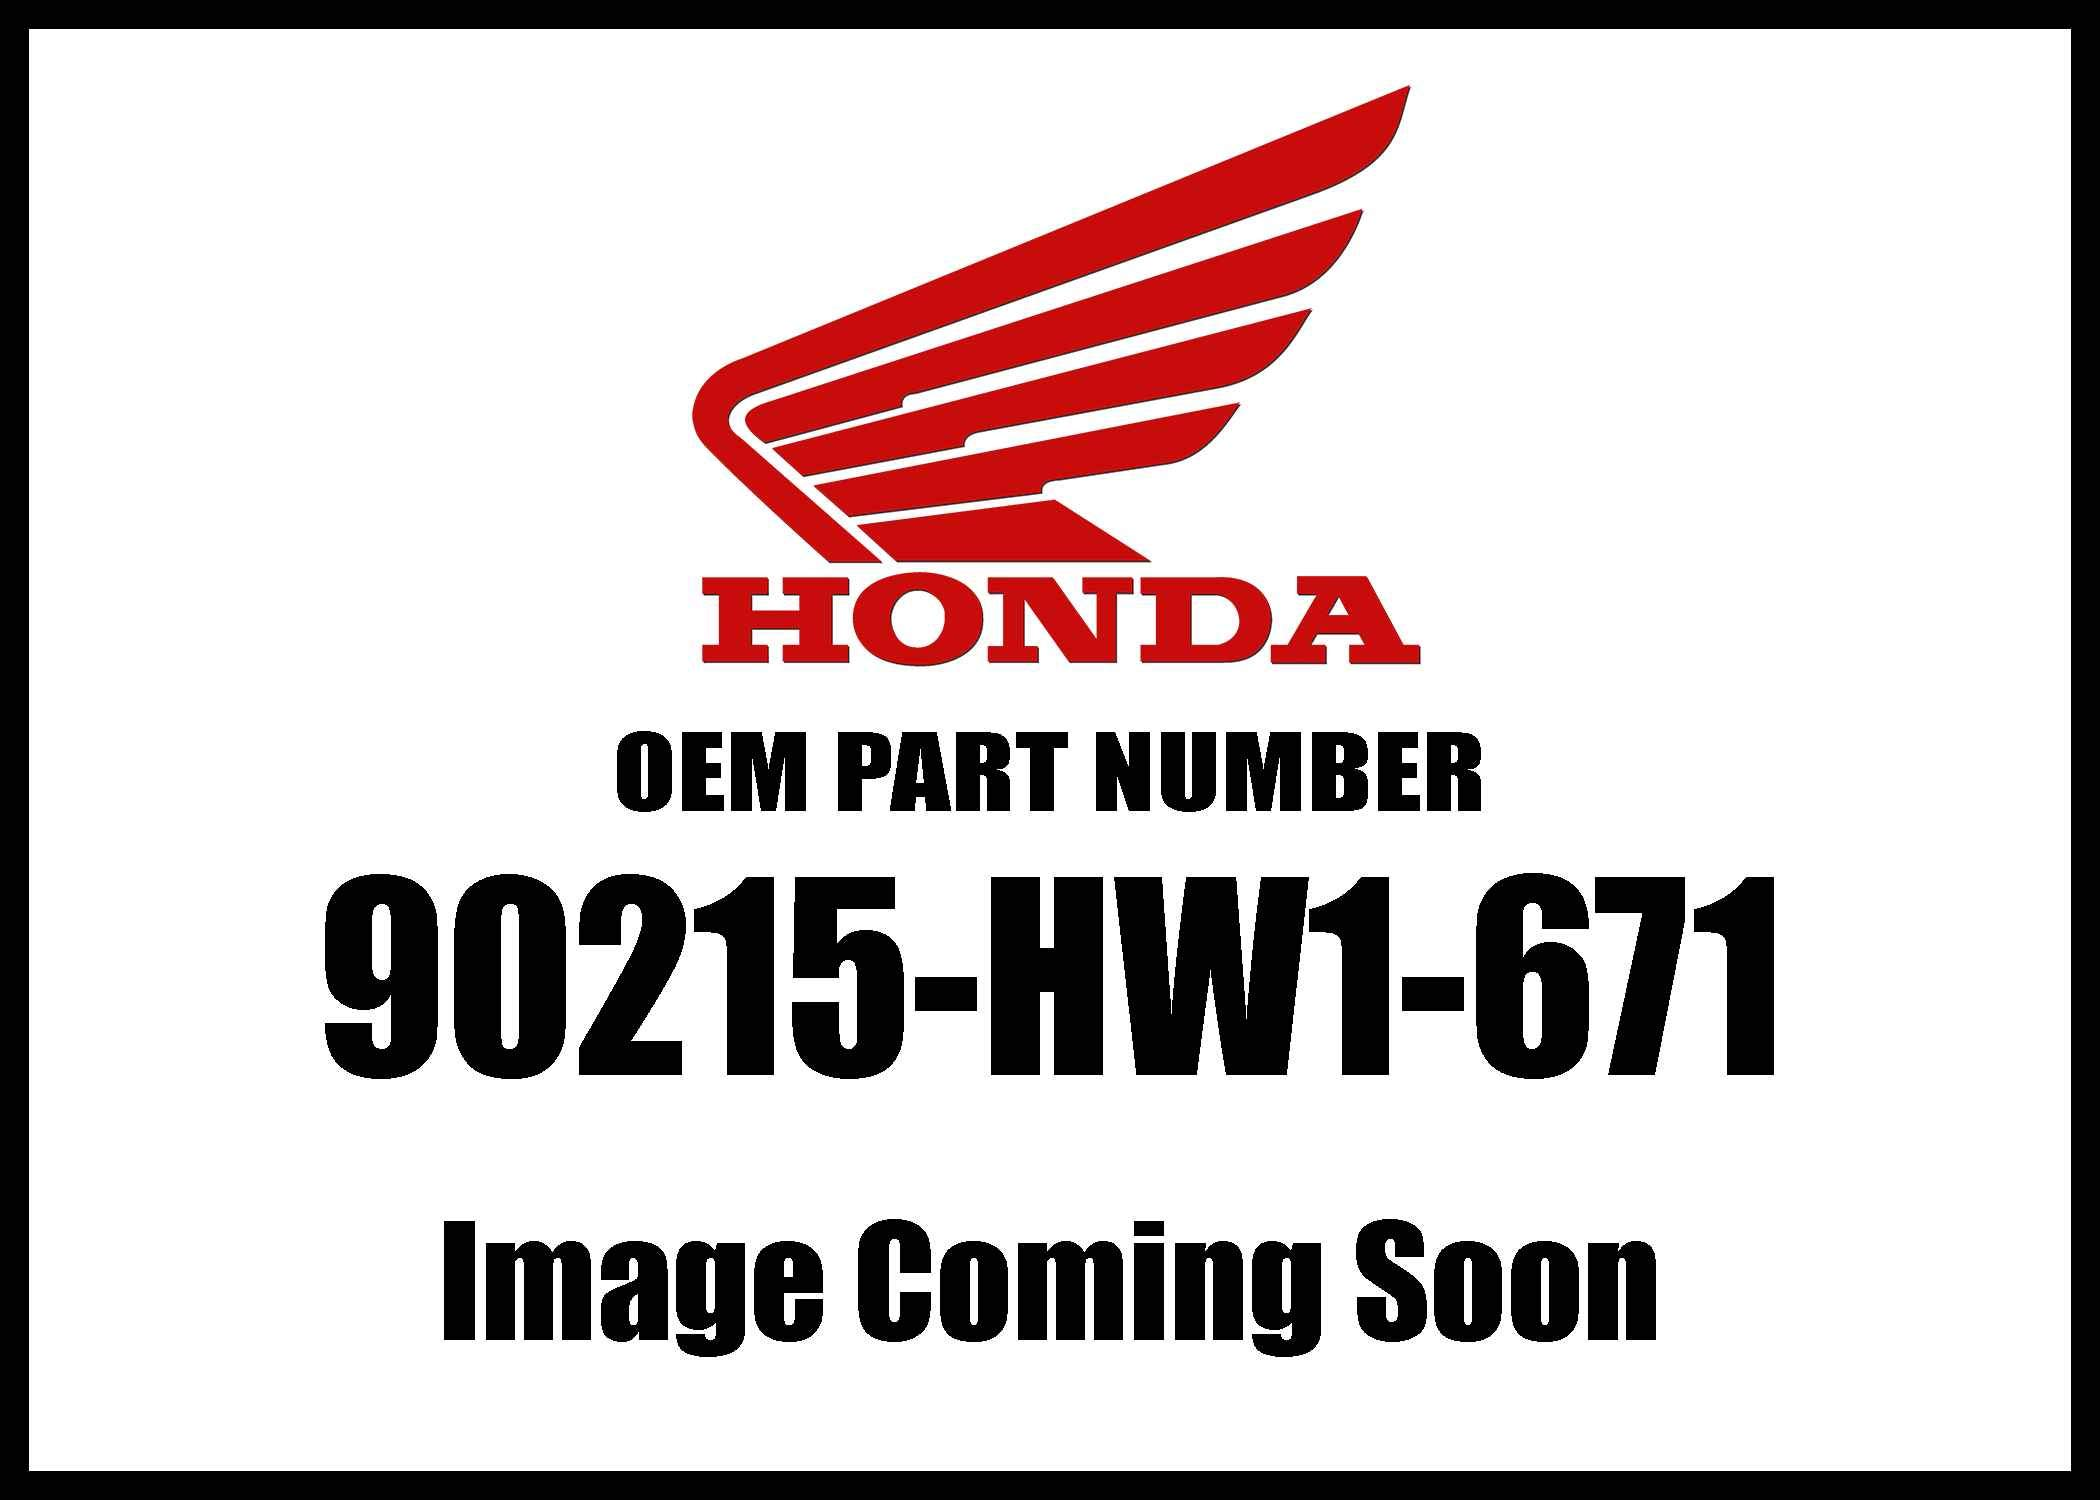 Honda 90215-HW1-671 Bolt Flange (6X16)